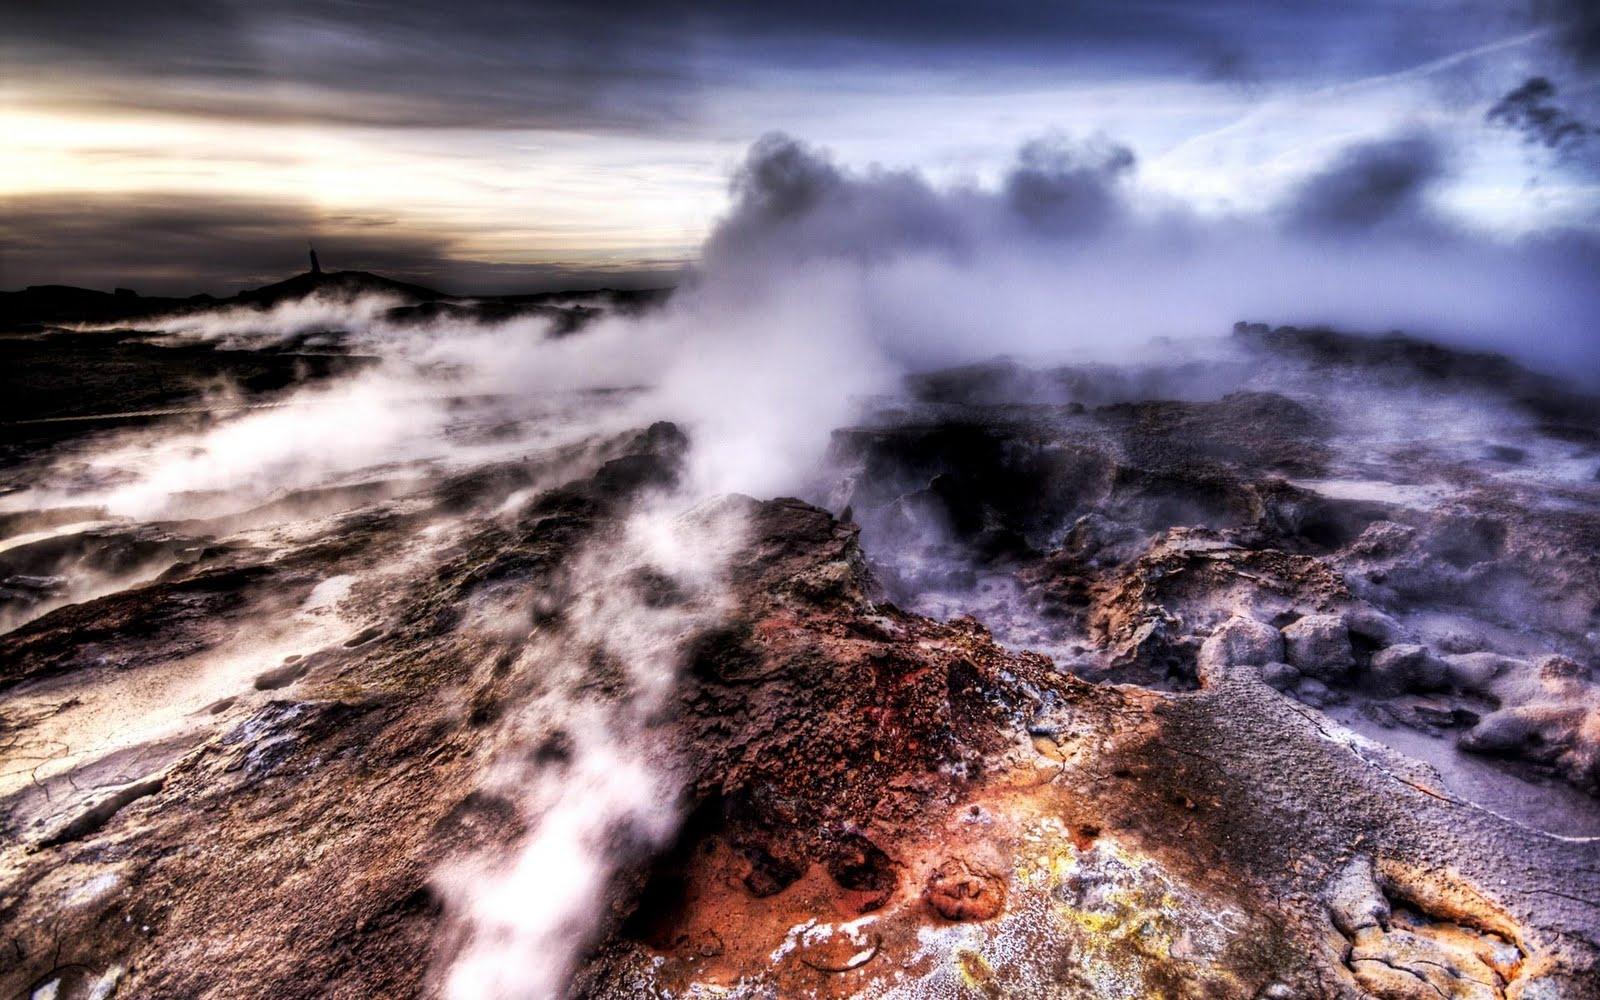 http://4.bp.blogspot.com/_uEzsKN7UlfU/THxN2qZbA8I/AAAAAAAAAEY/SqyZCYnqB5U/s1600/hdr-iceland-landscape-cookie-island_1920x1200.jpg